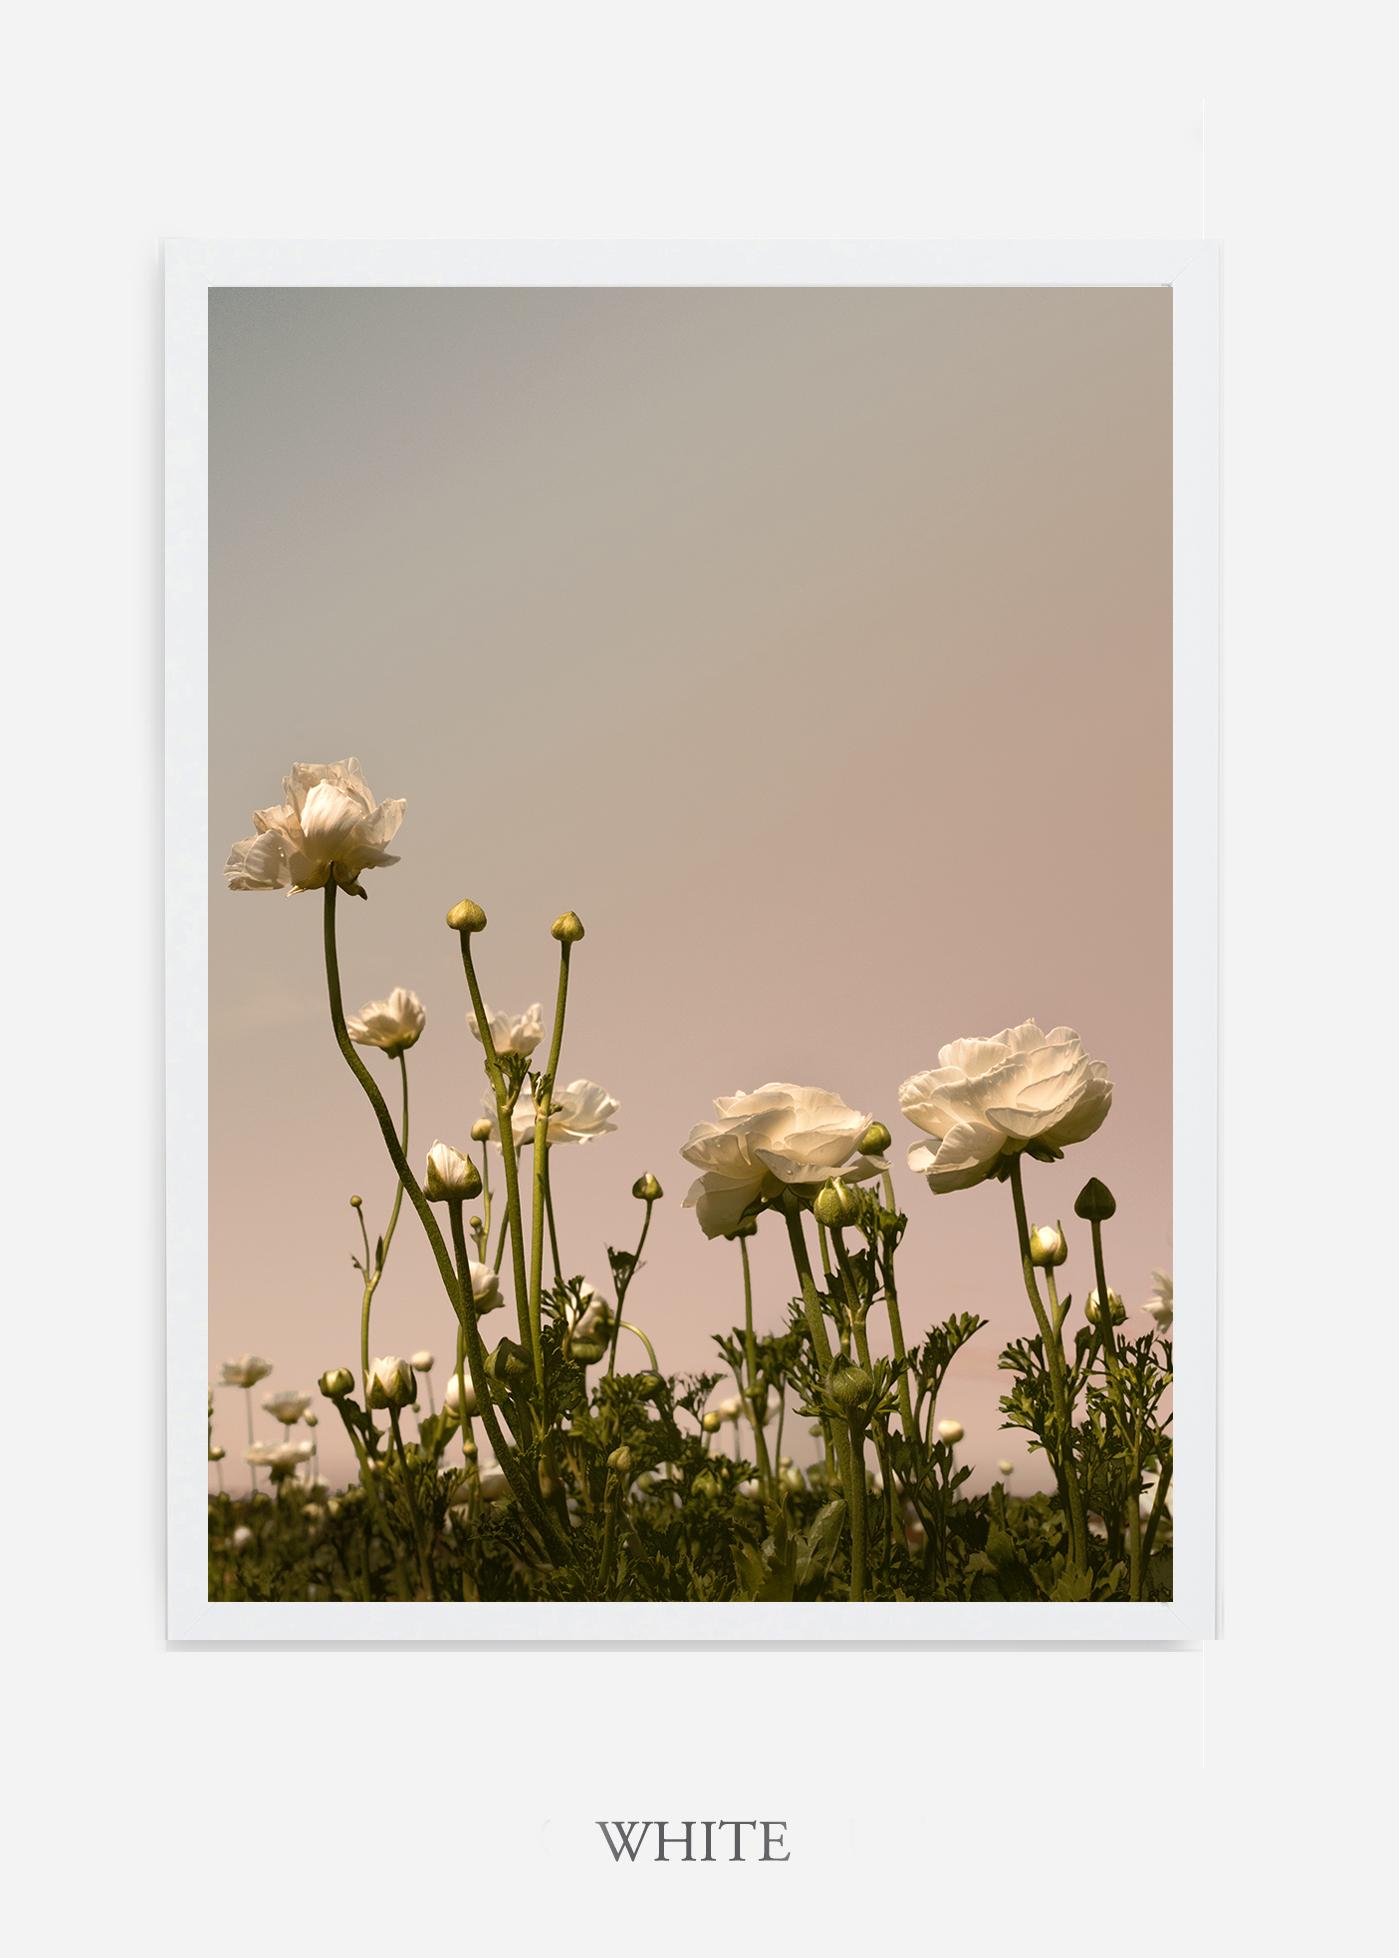 NoMat-White-Frame-Floral-No-7-Wilder-California-Art-Floral-Home-decor-Prints-Dahlia-Botanical-Artwork-Interior-design.jpg